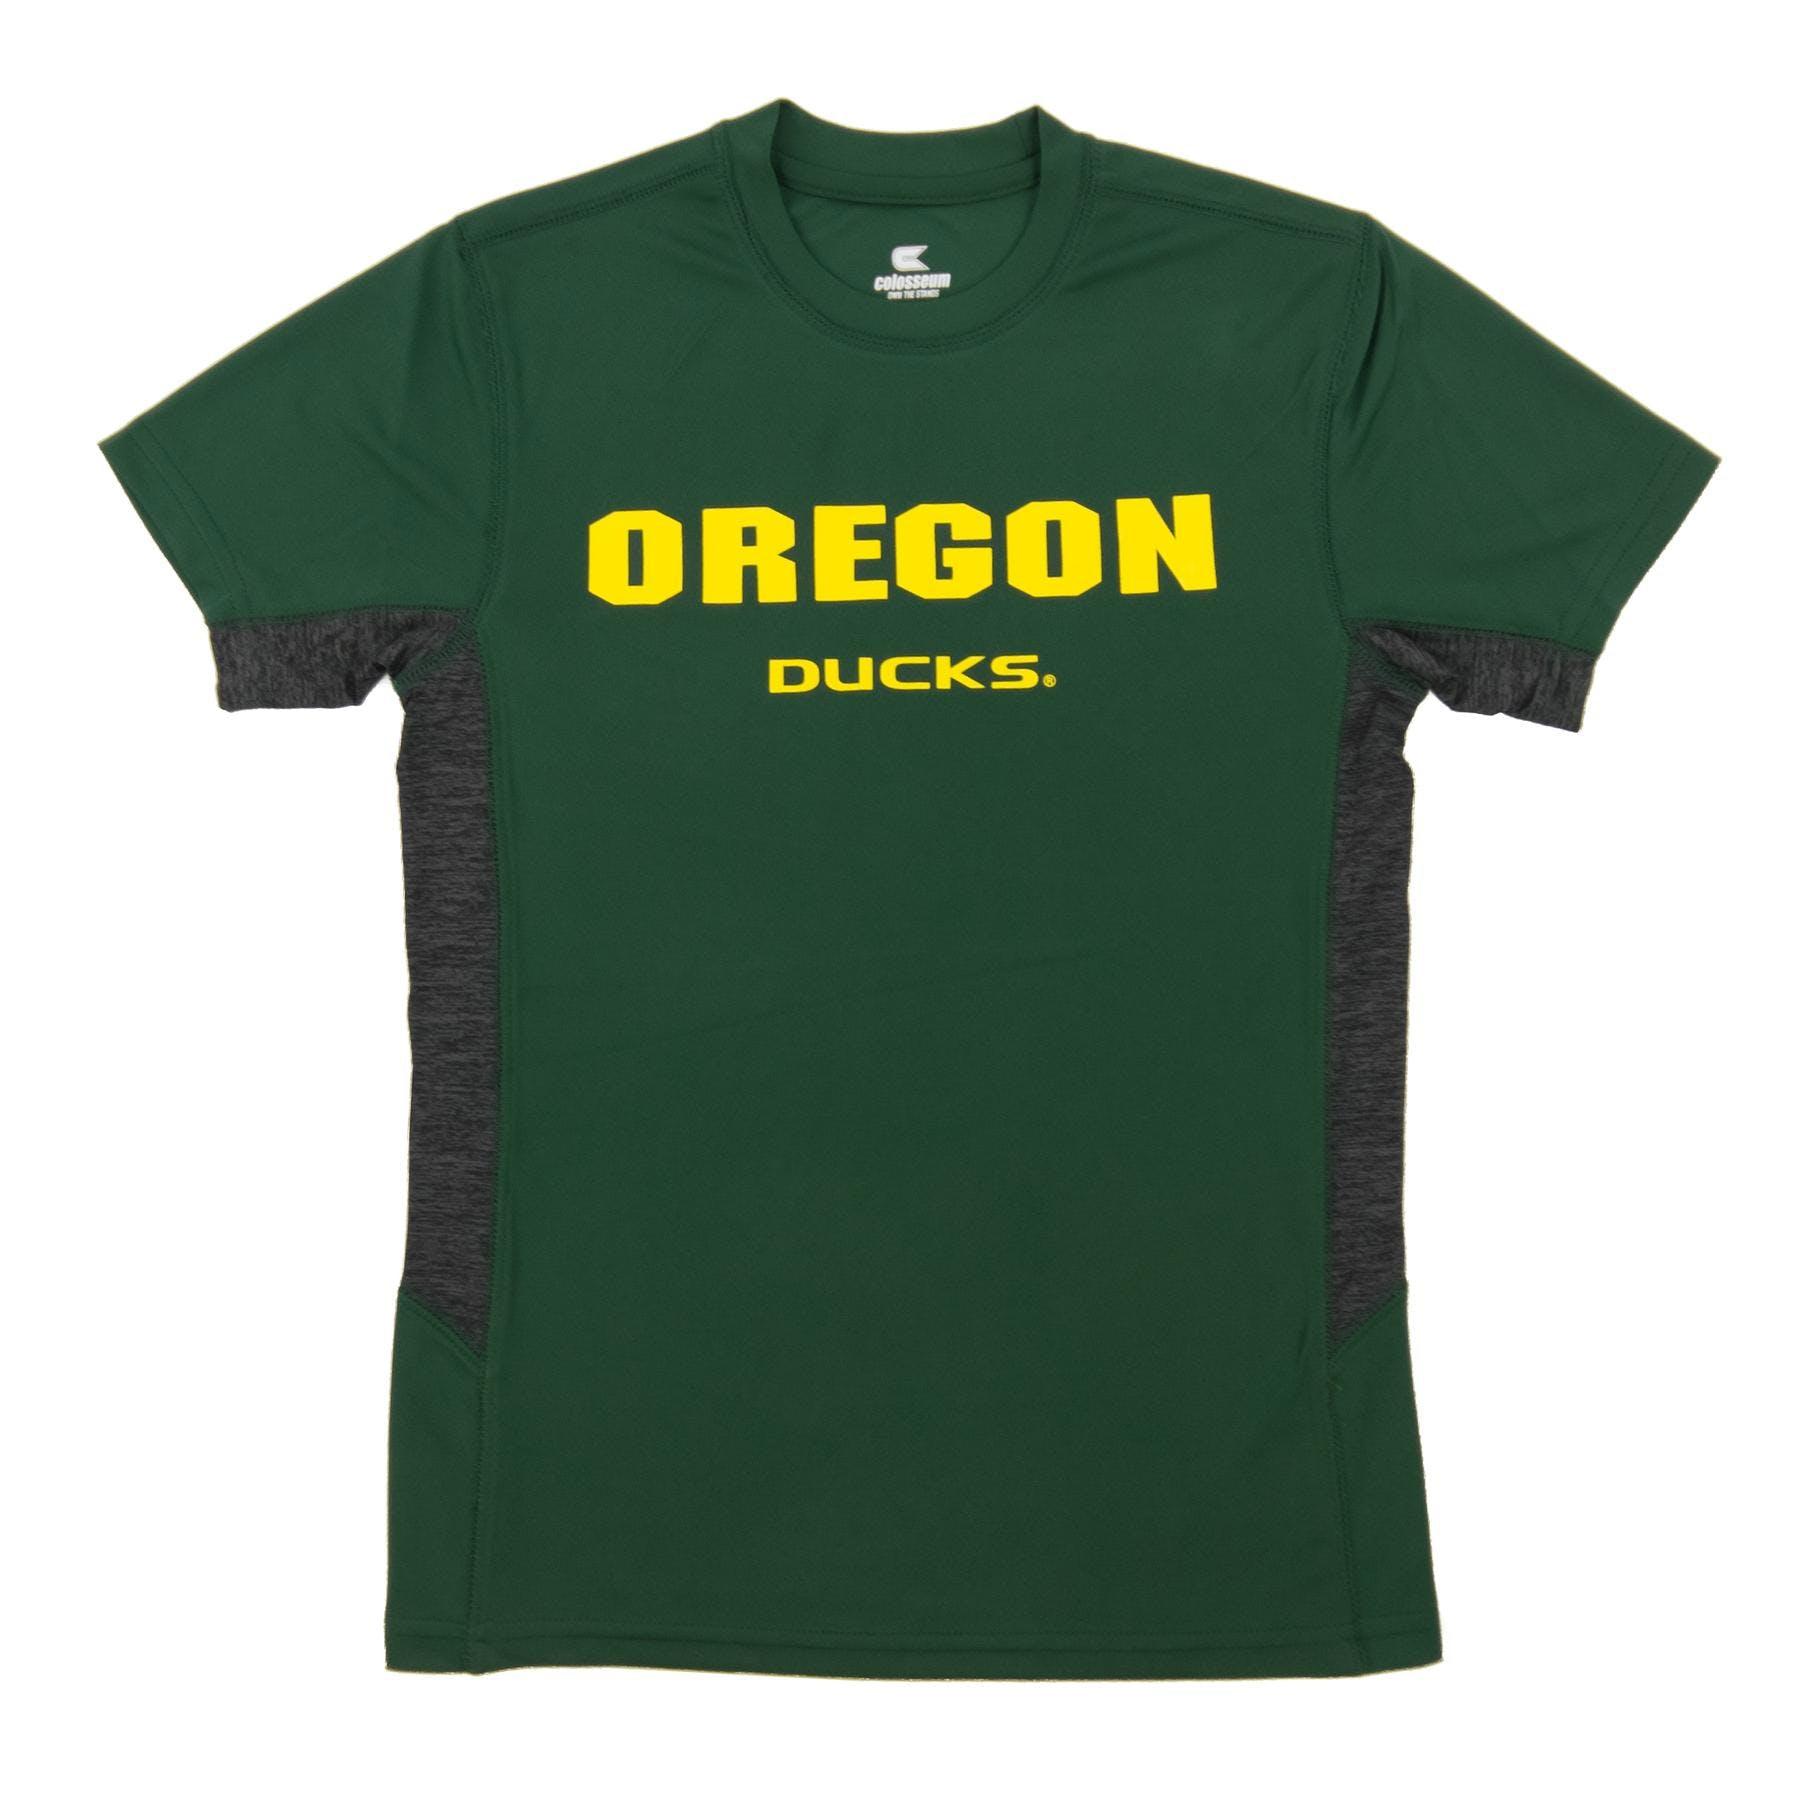 6514f3839992 Oregon Ducks Colosseum Green Youth Performance Ultra Tee Shirt